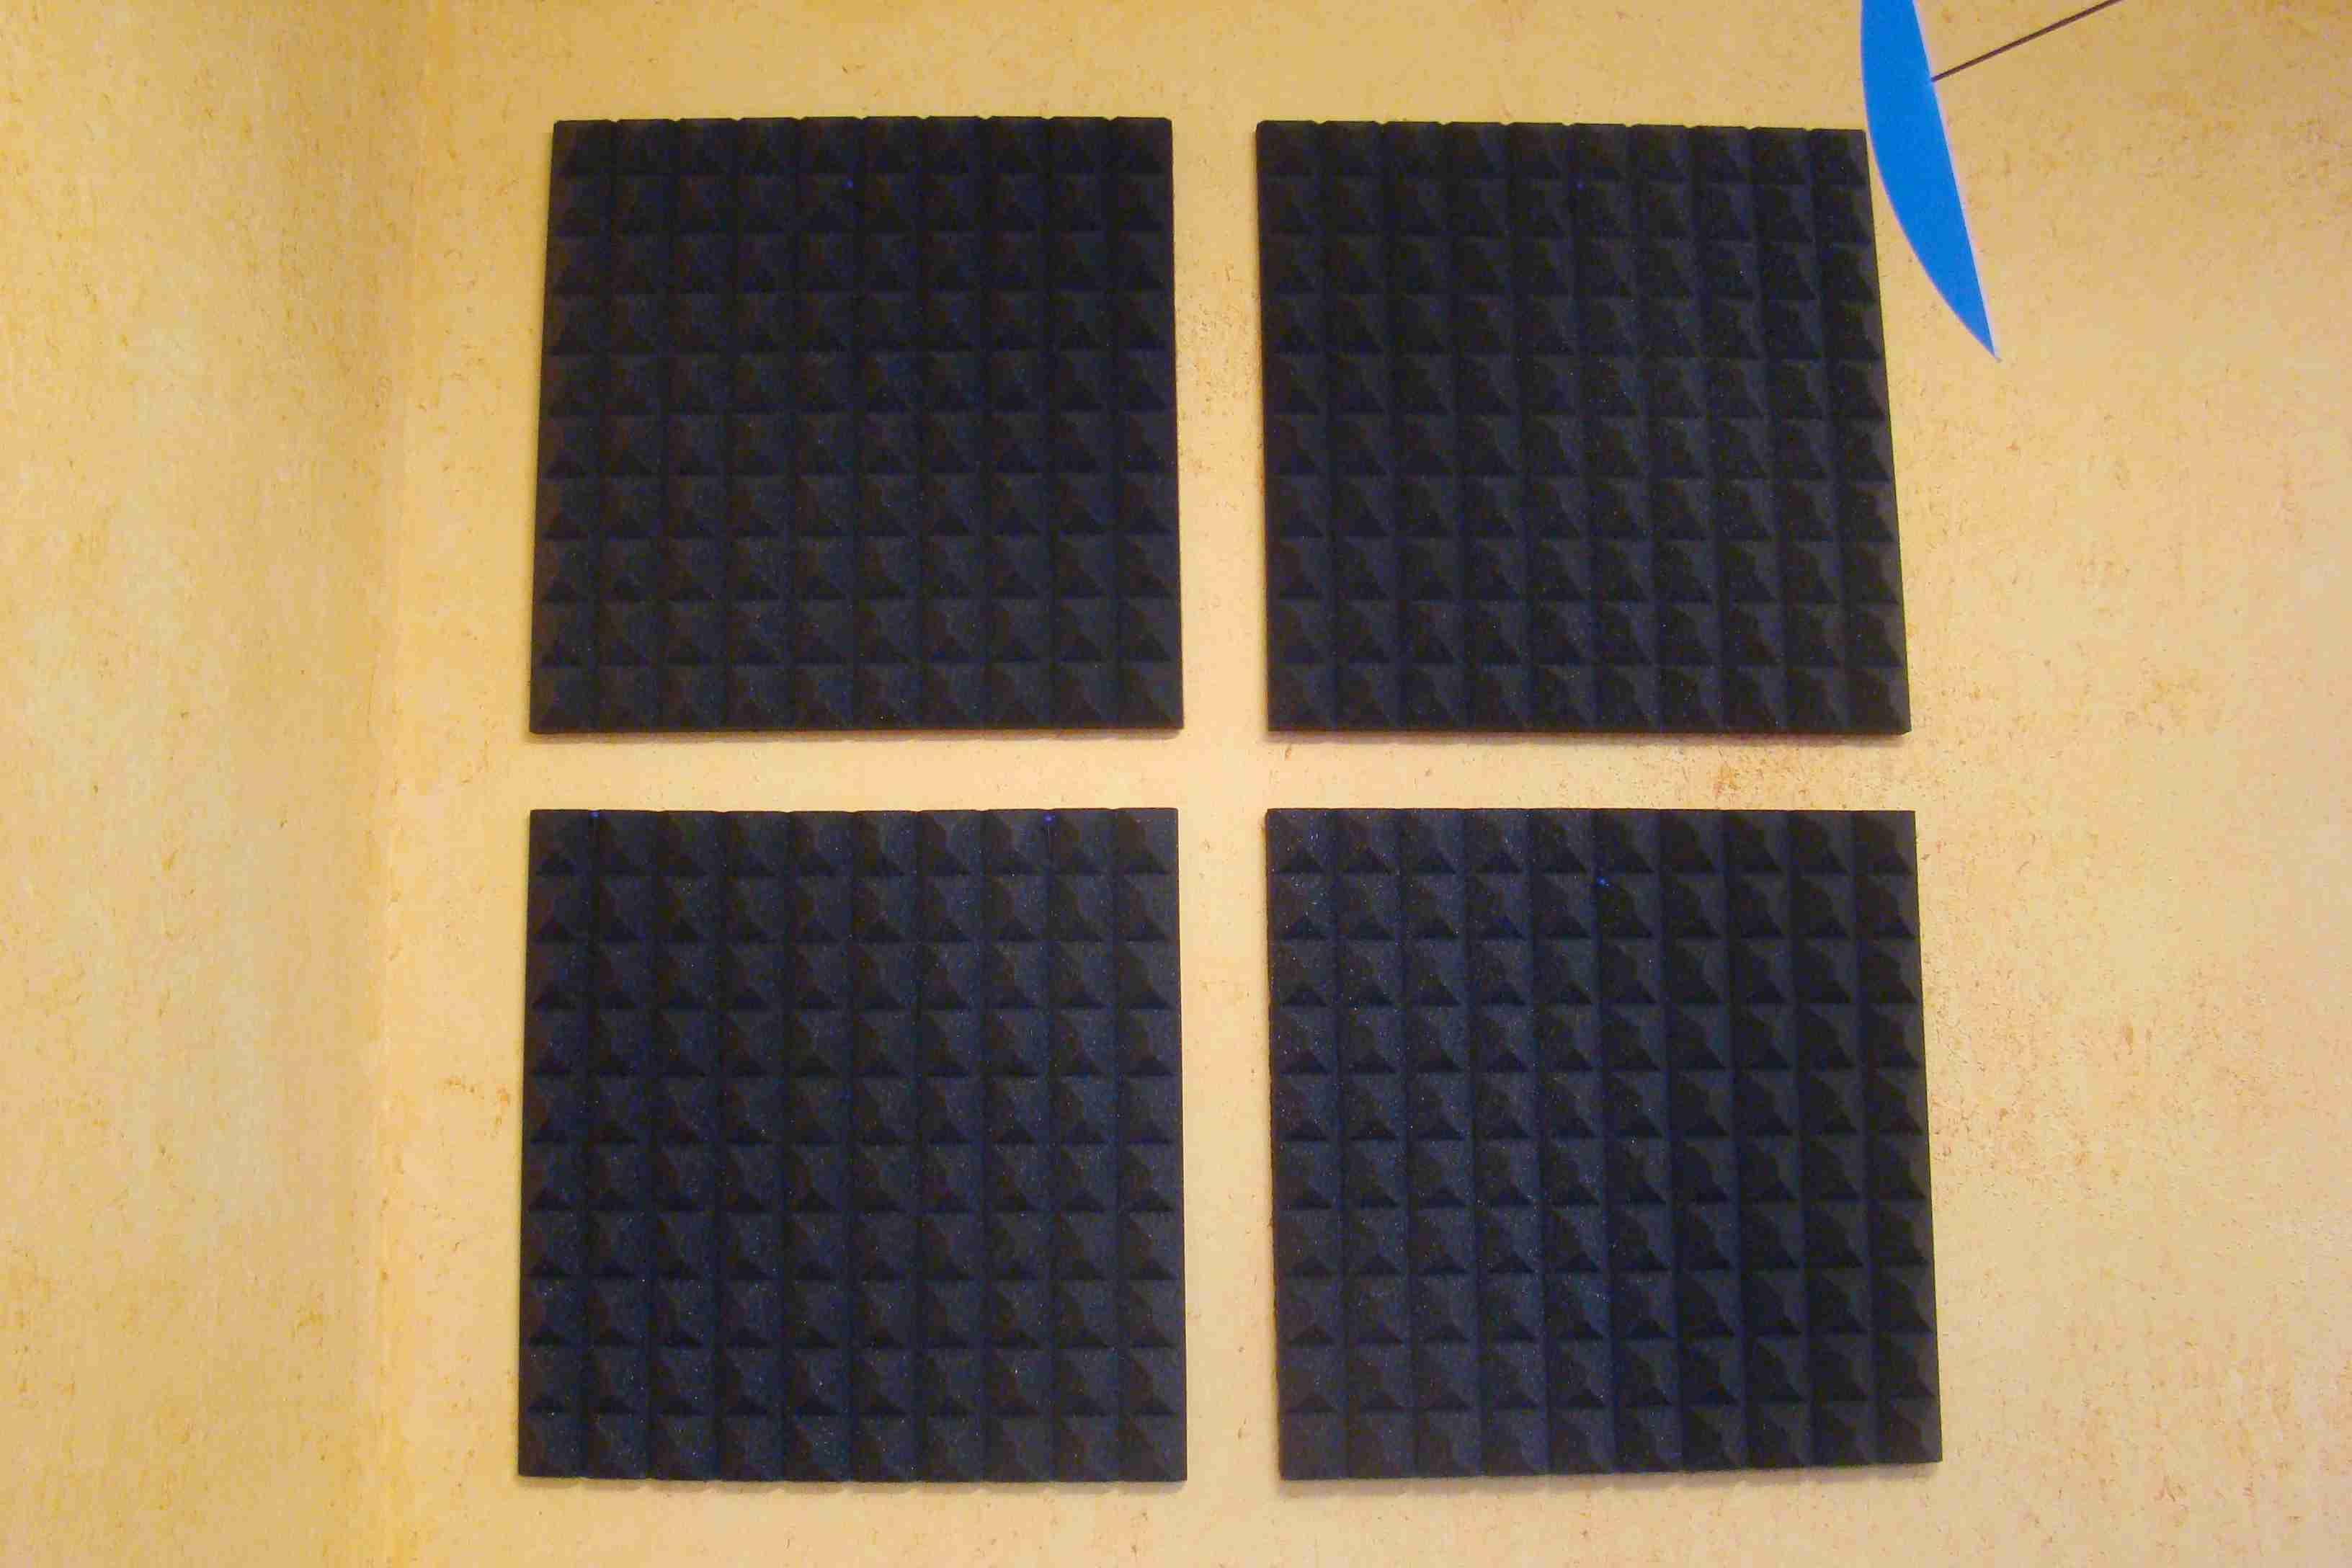 Akustikschaumplatten, Noppenschaum, 4 cm, selbstklebend, Set 13